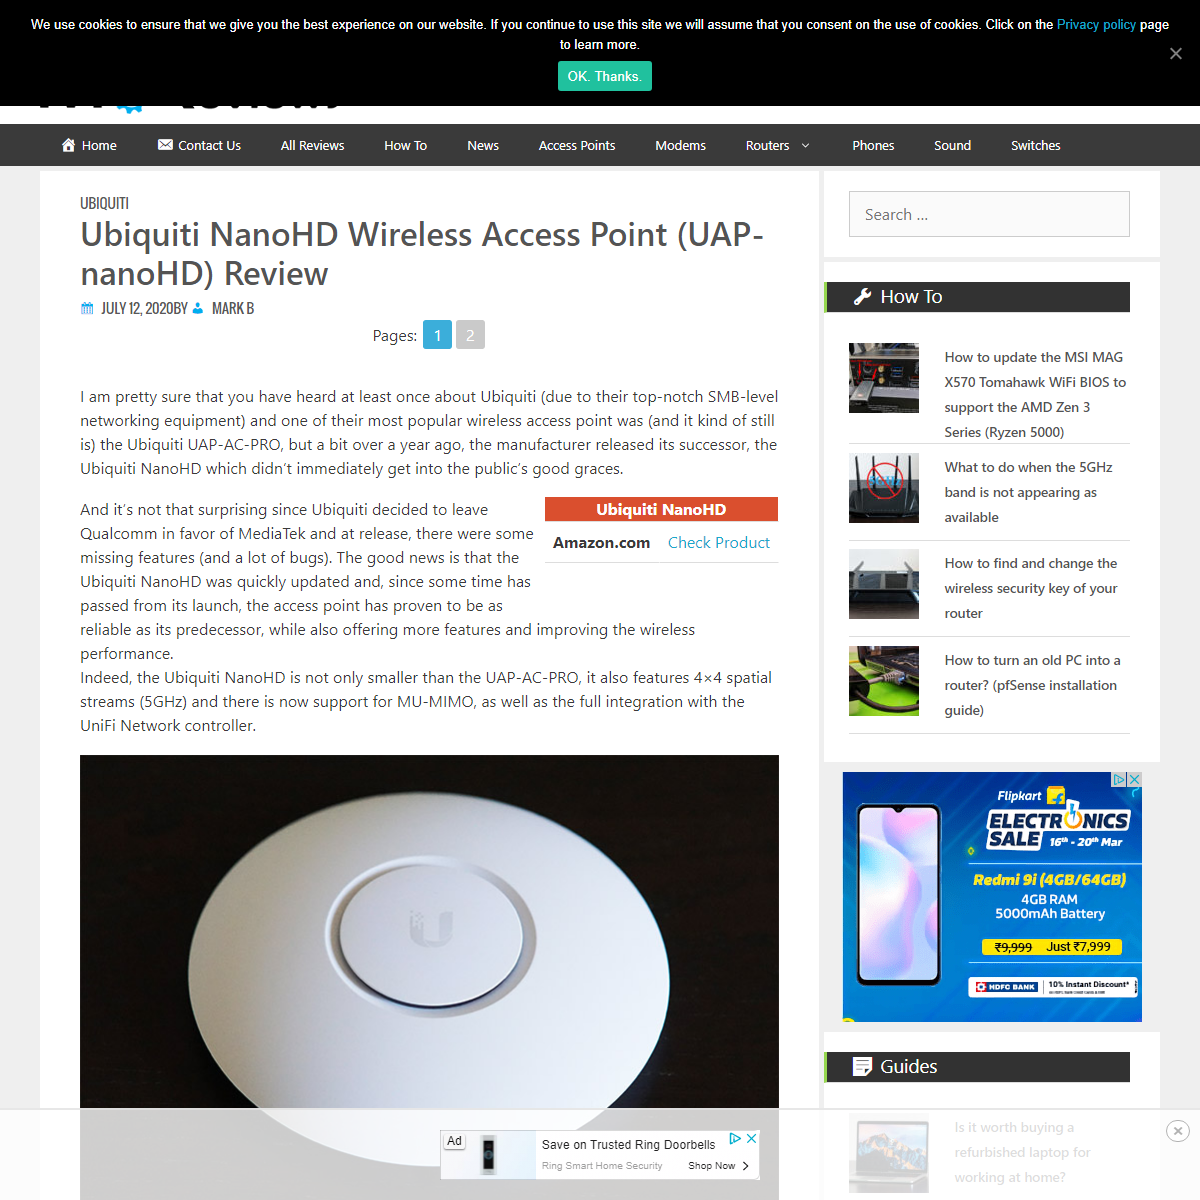 Ubiquiti NanoHD Wireless Access Point (UAP-nanoHD) Review – MBReviews